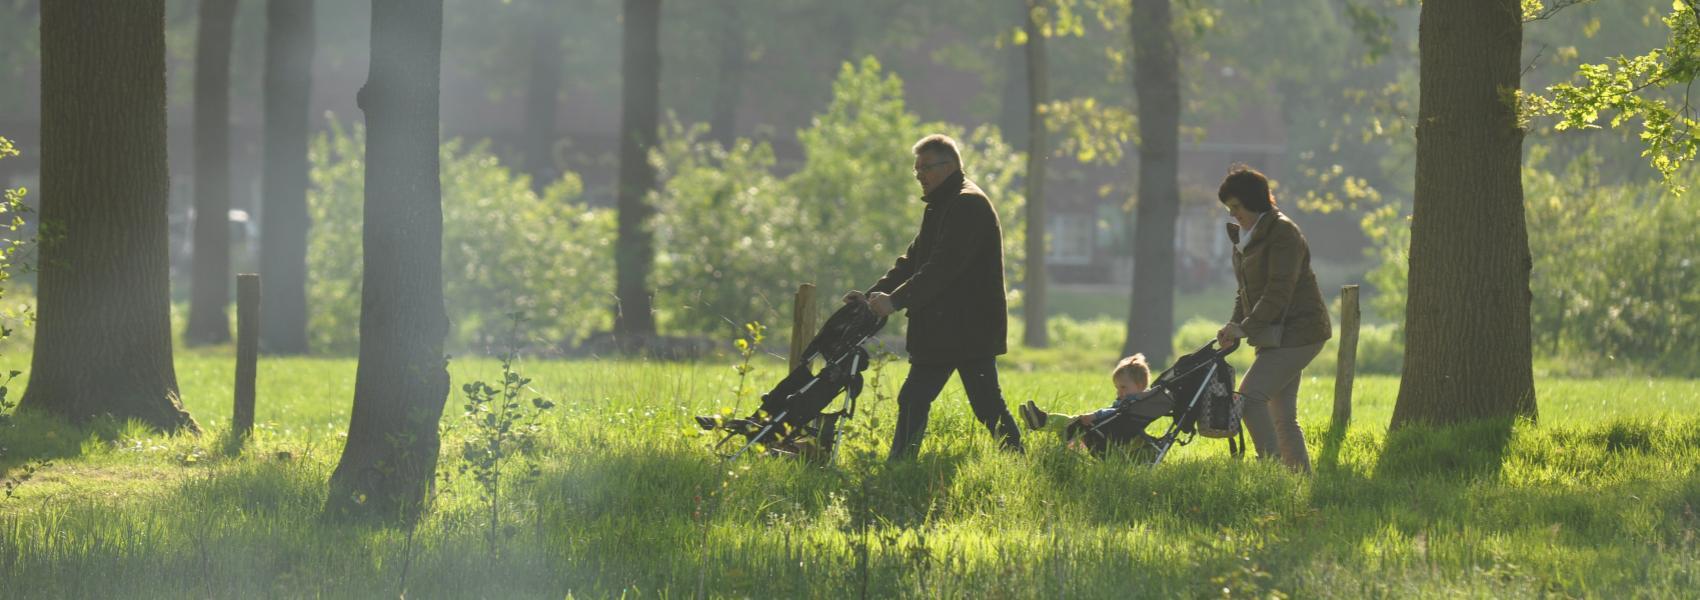 wandelaars met kinderwagens in het bos